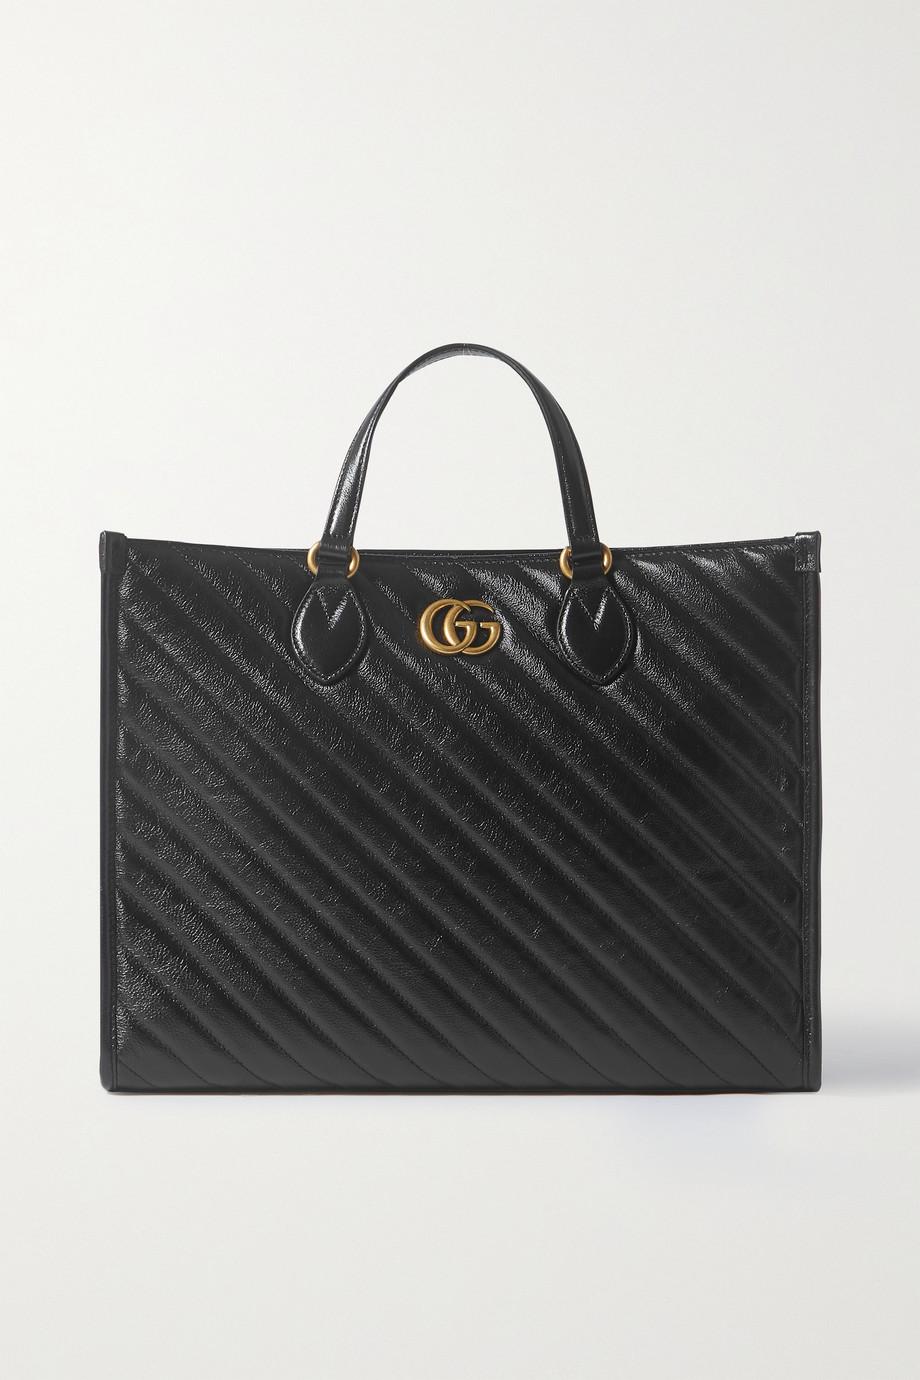 Gucci GG Marmont 绗缝皮革中号手提包